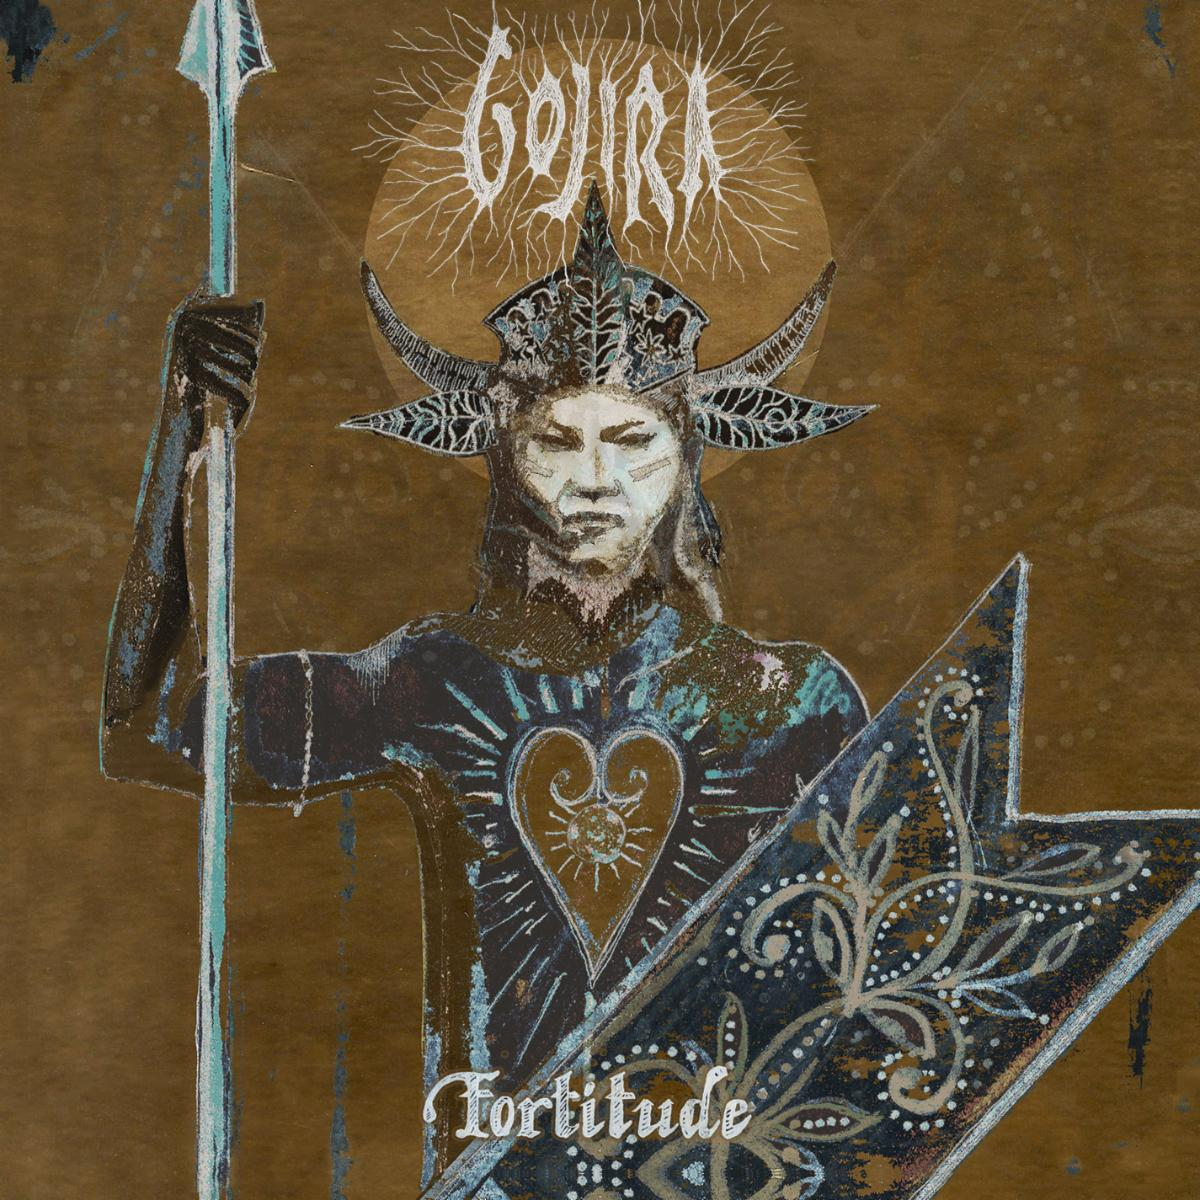 Gojira - Fortitude (2021) Fortitude-Gojira